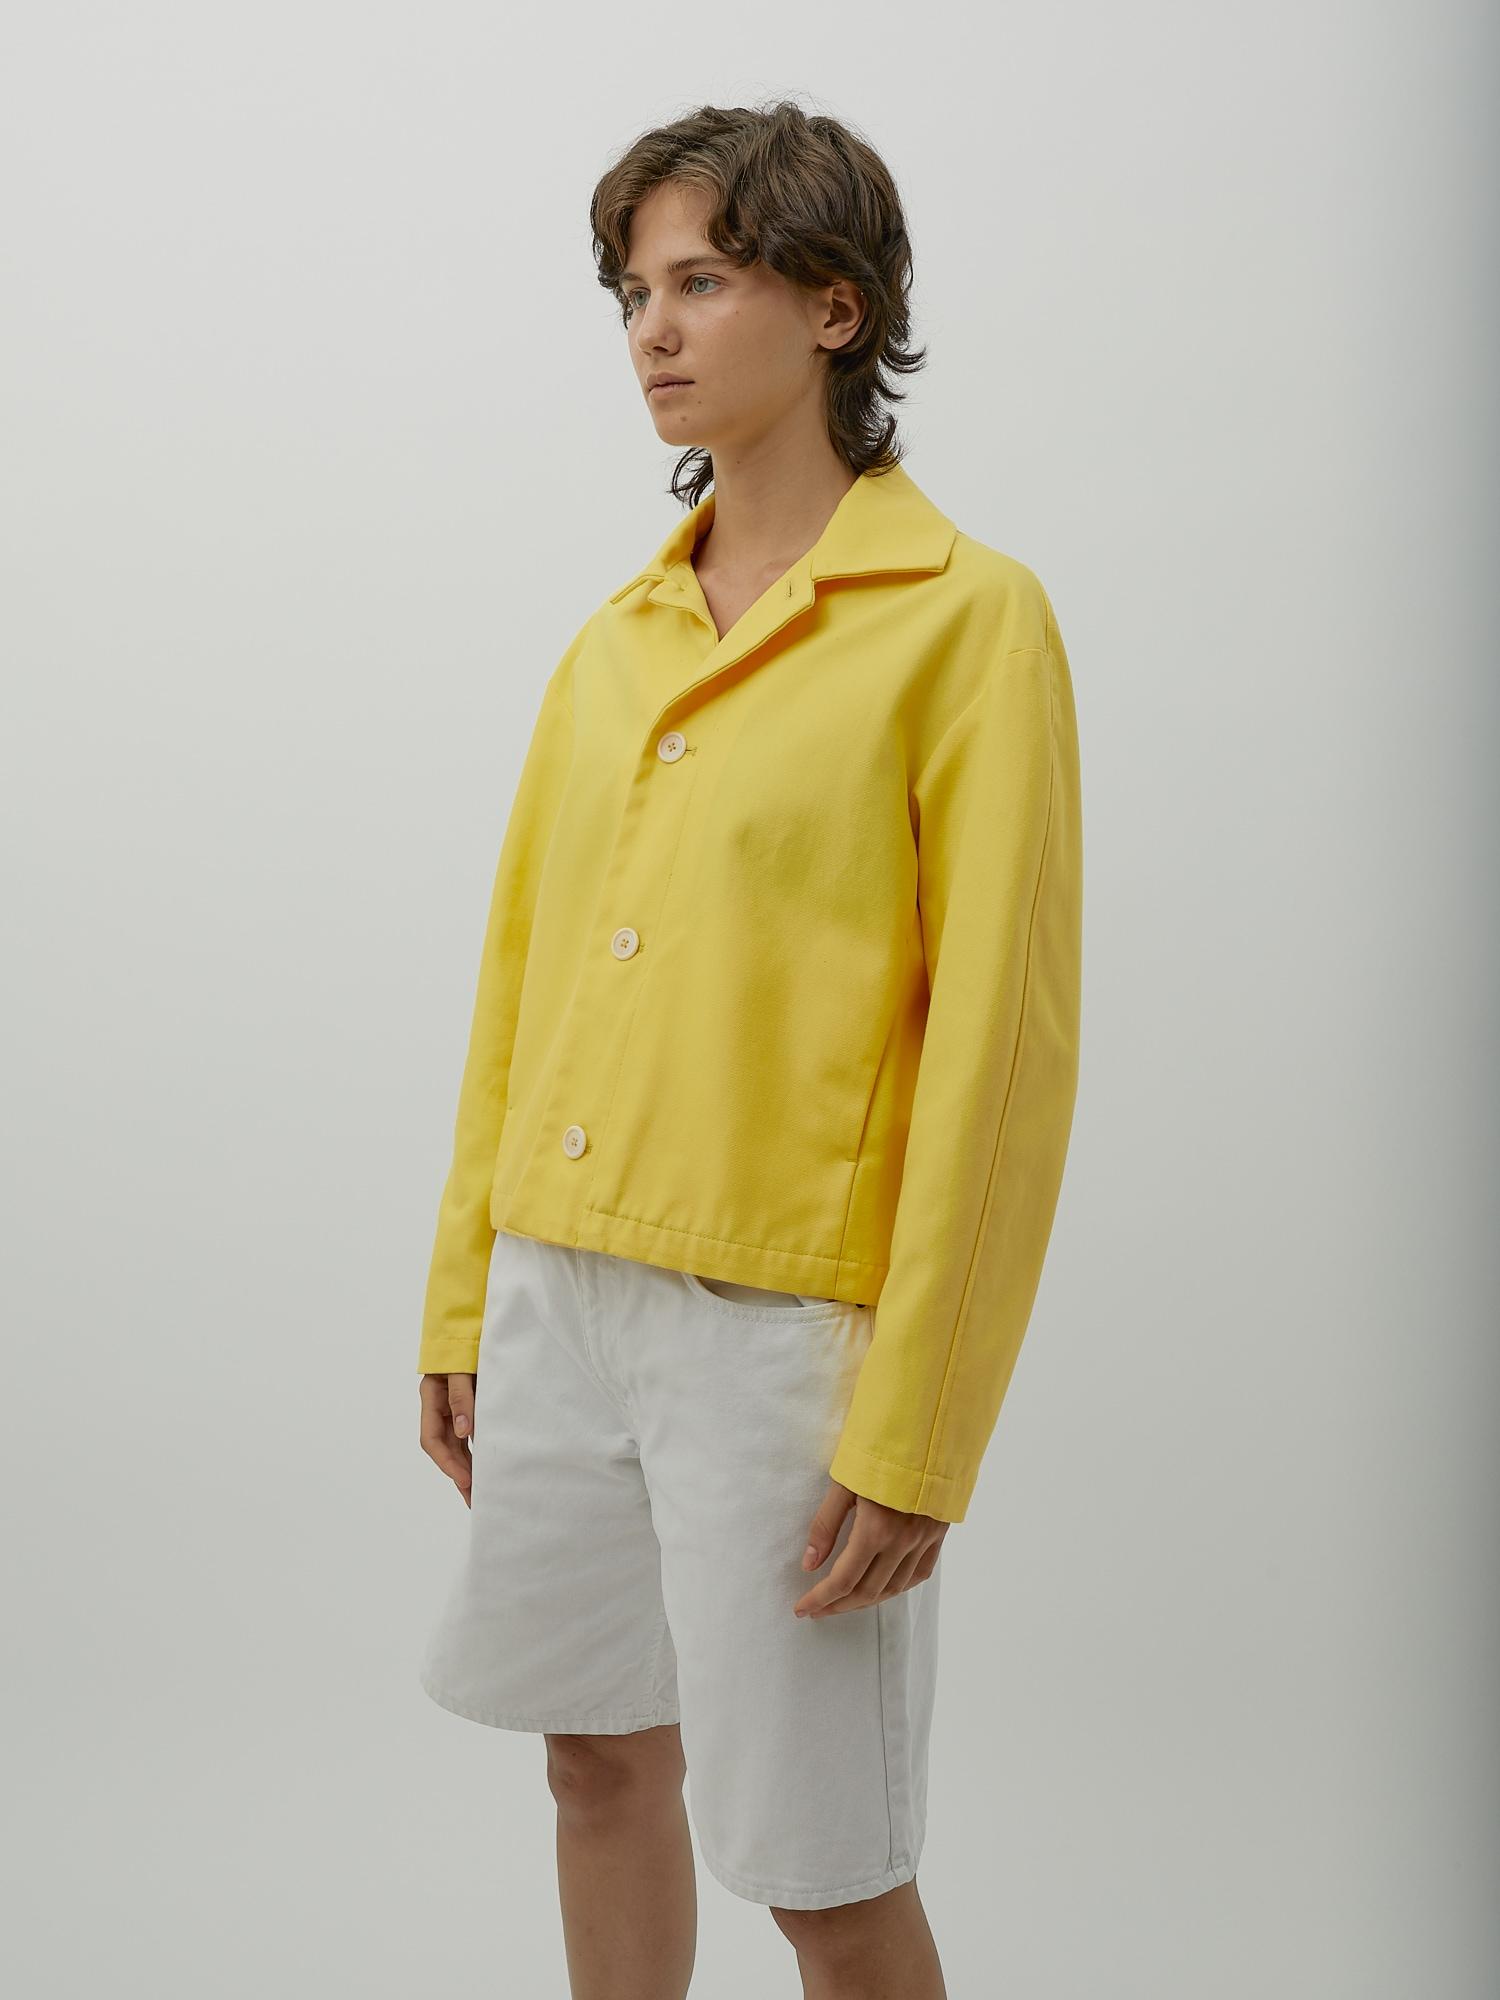 Gender Neutral Jacket in Yellow